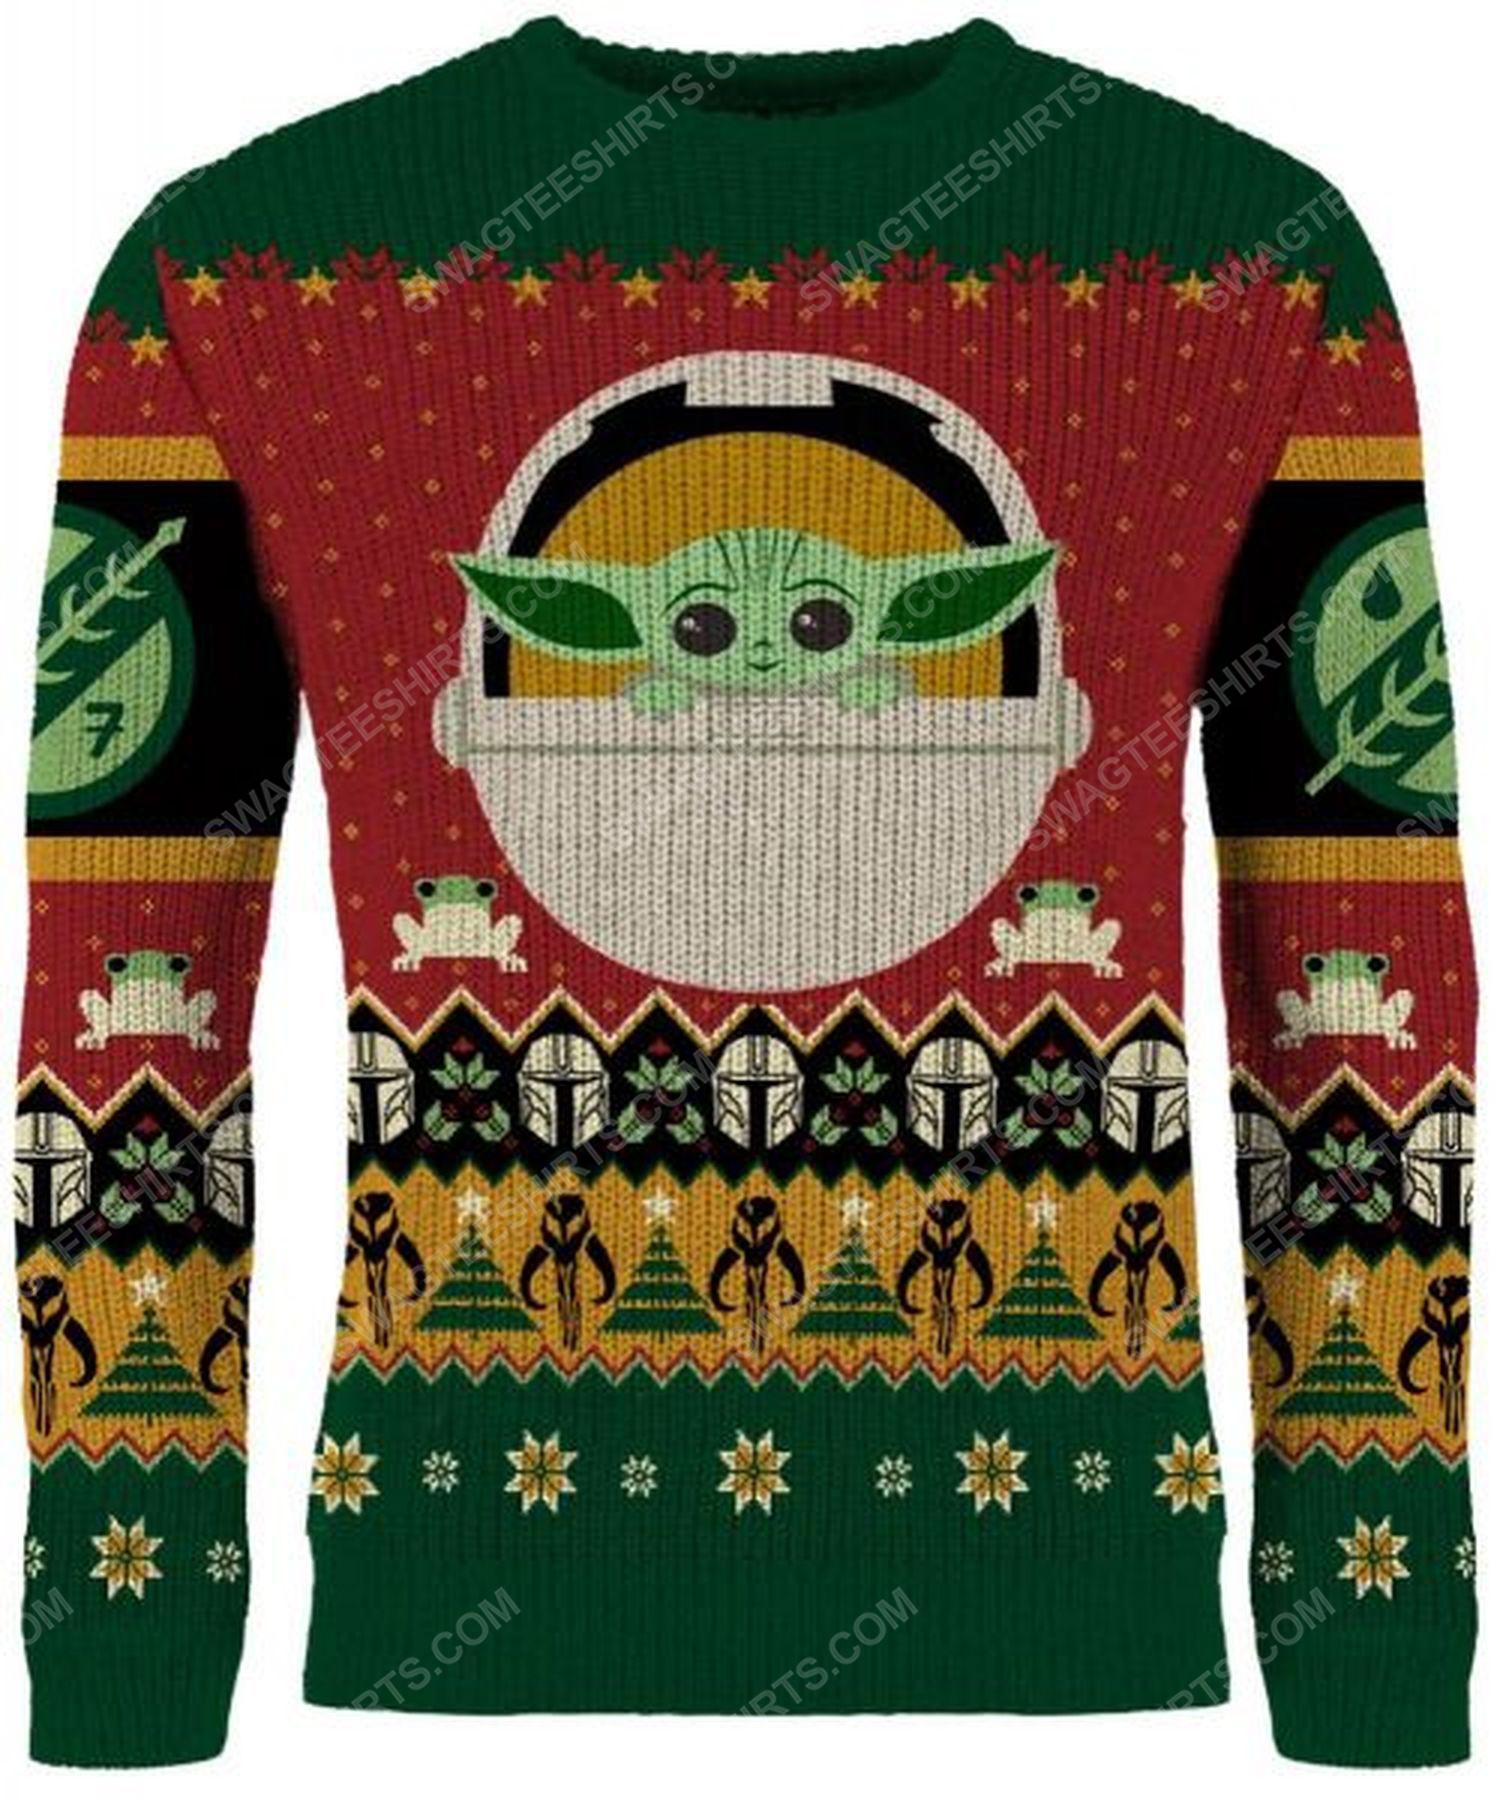 Star wars the mandalorian full print ugly christmas sweater 2 - Copy (2)